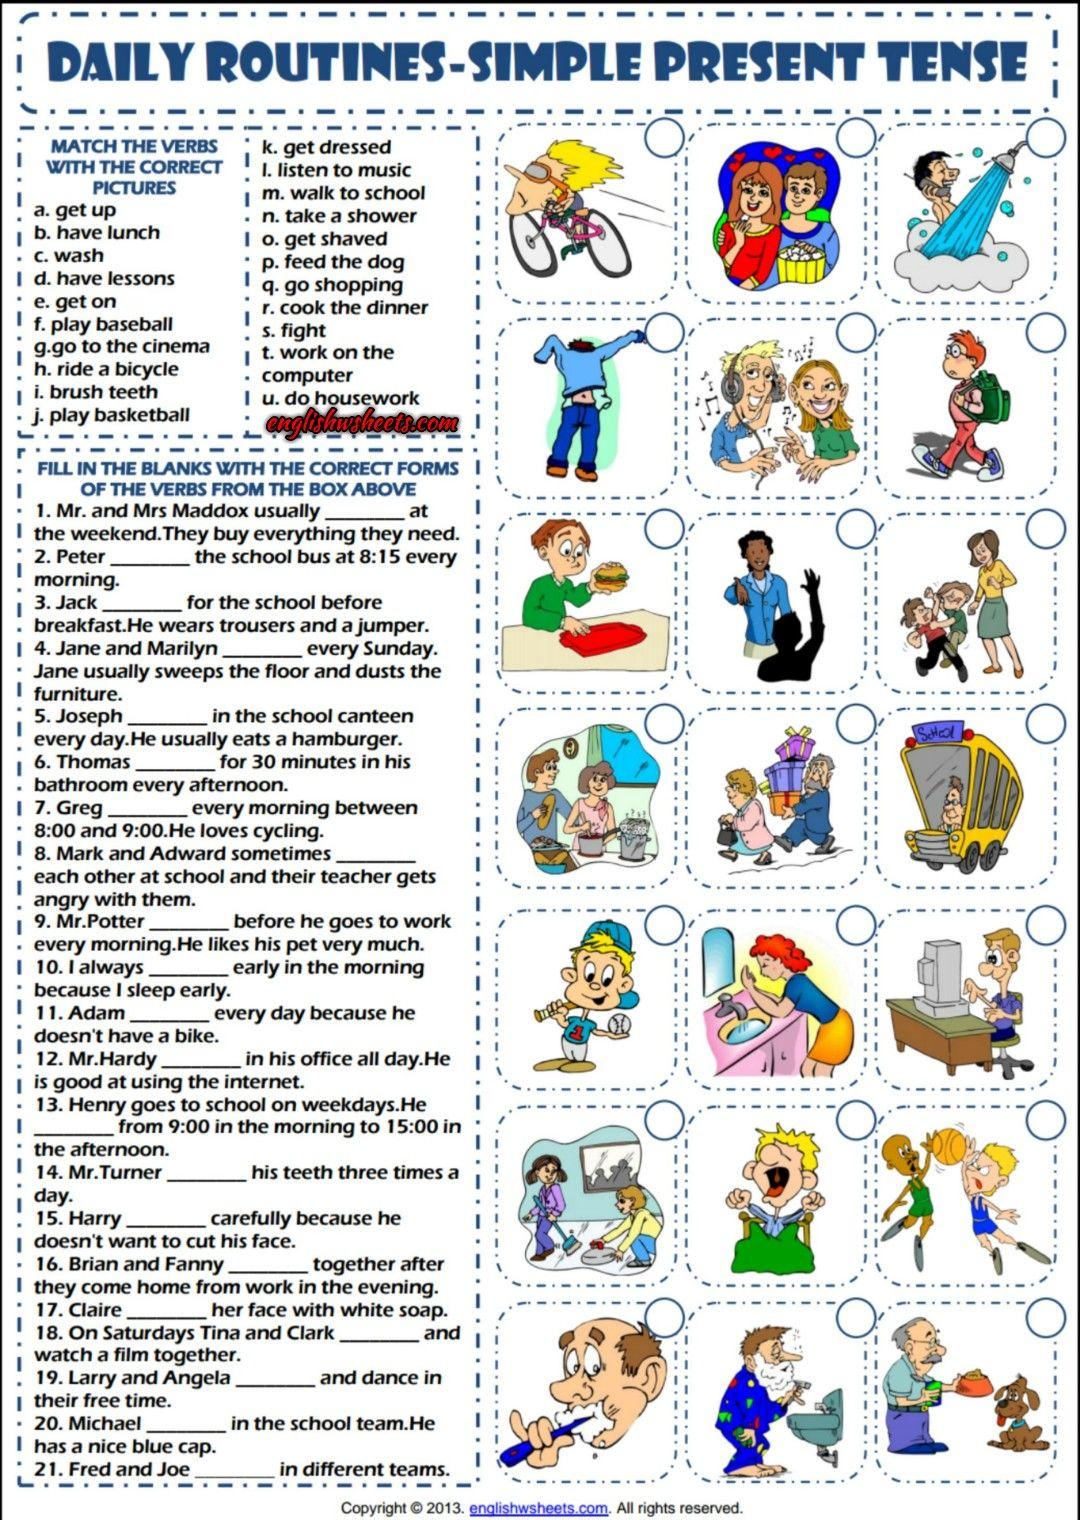 Daily Routines Simple Present Tense Esl Worksheet Education